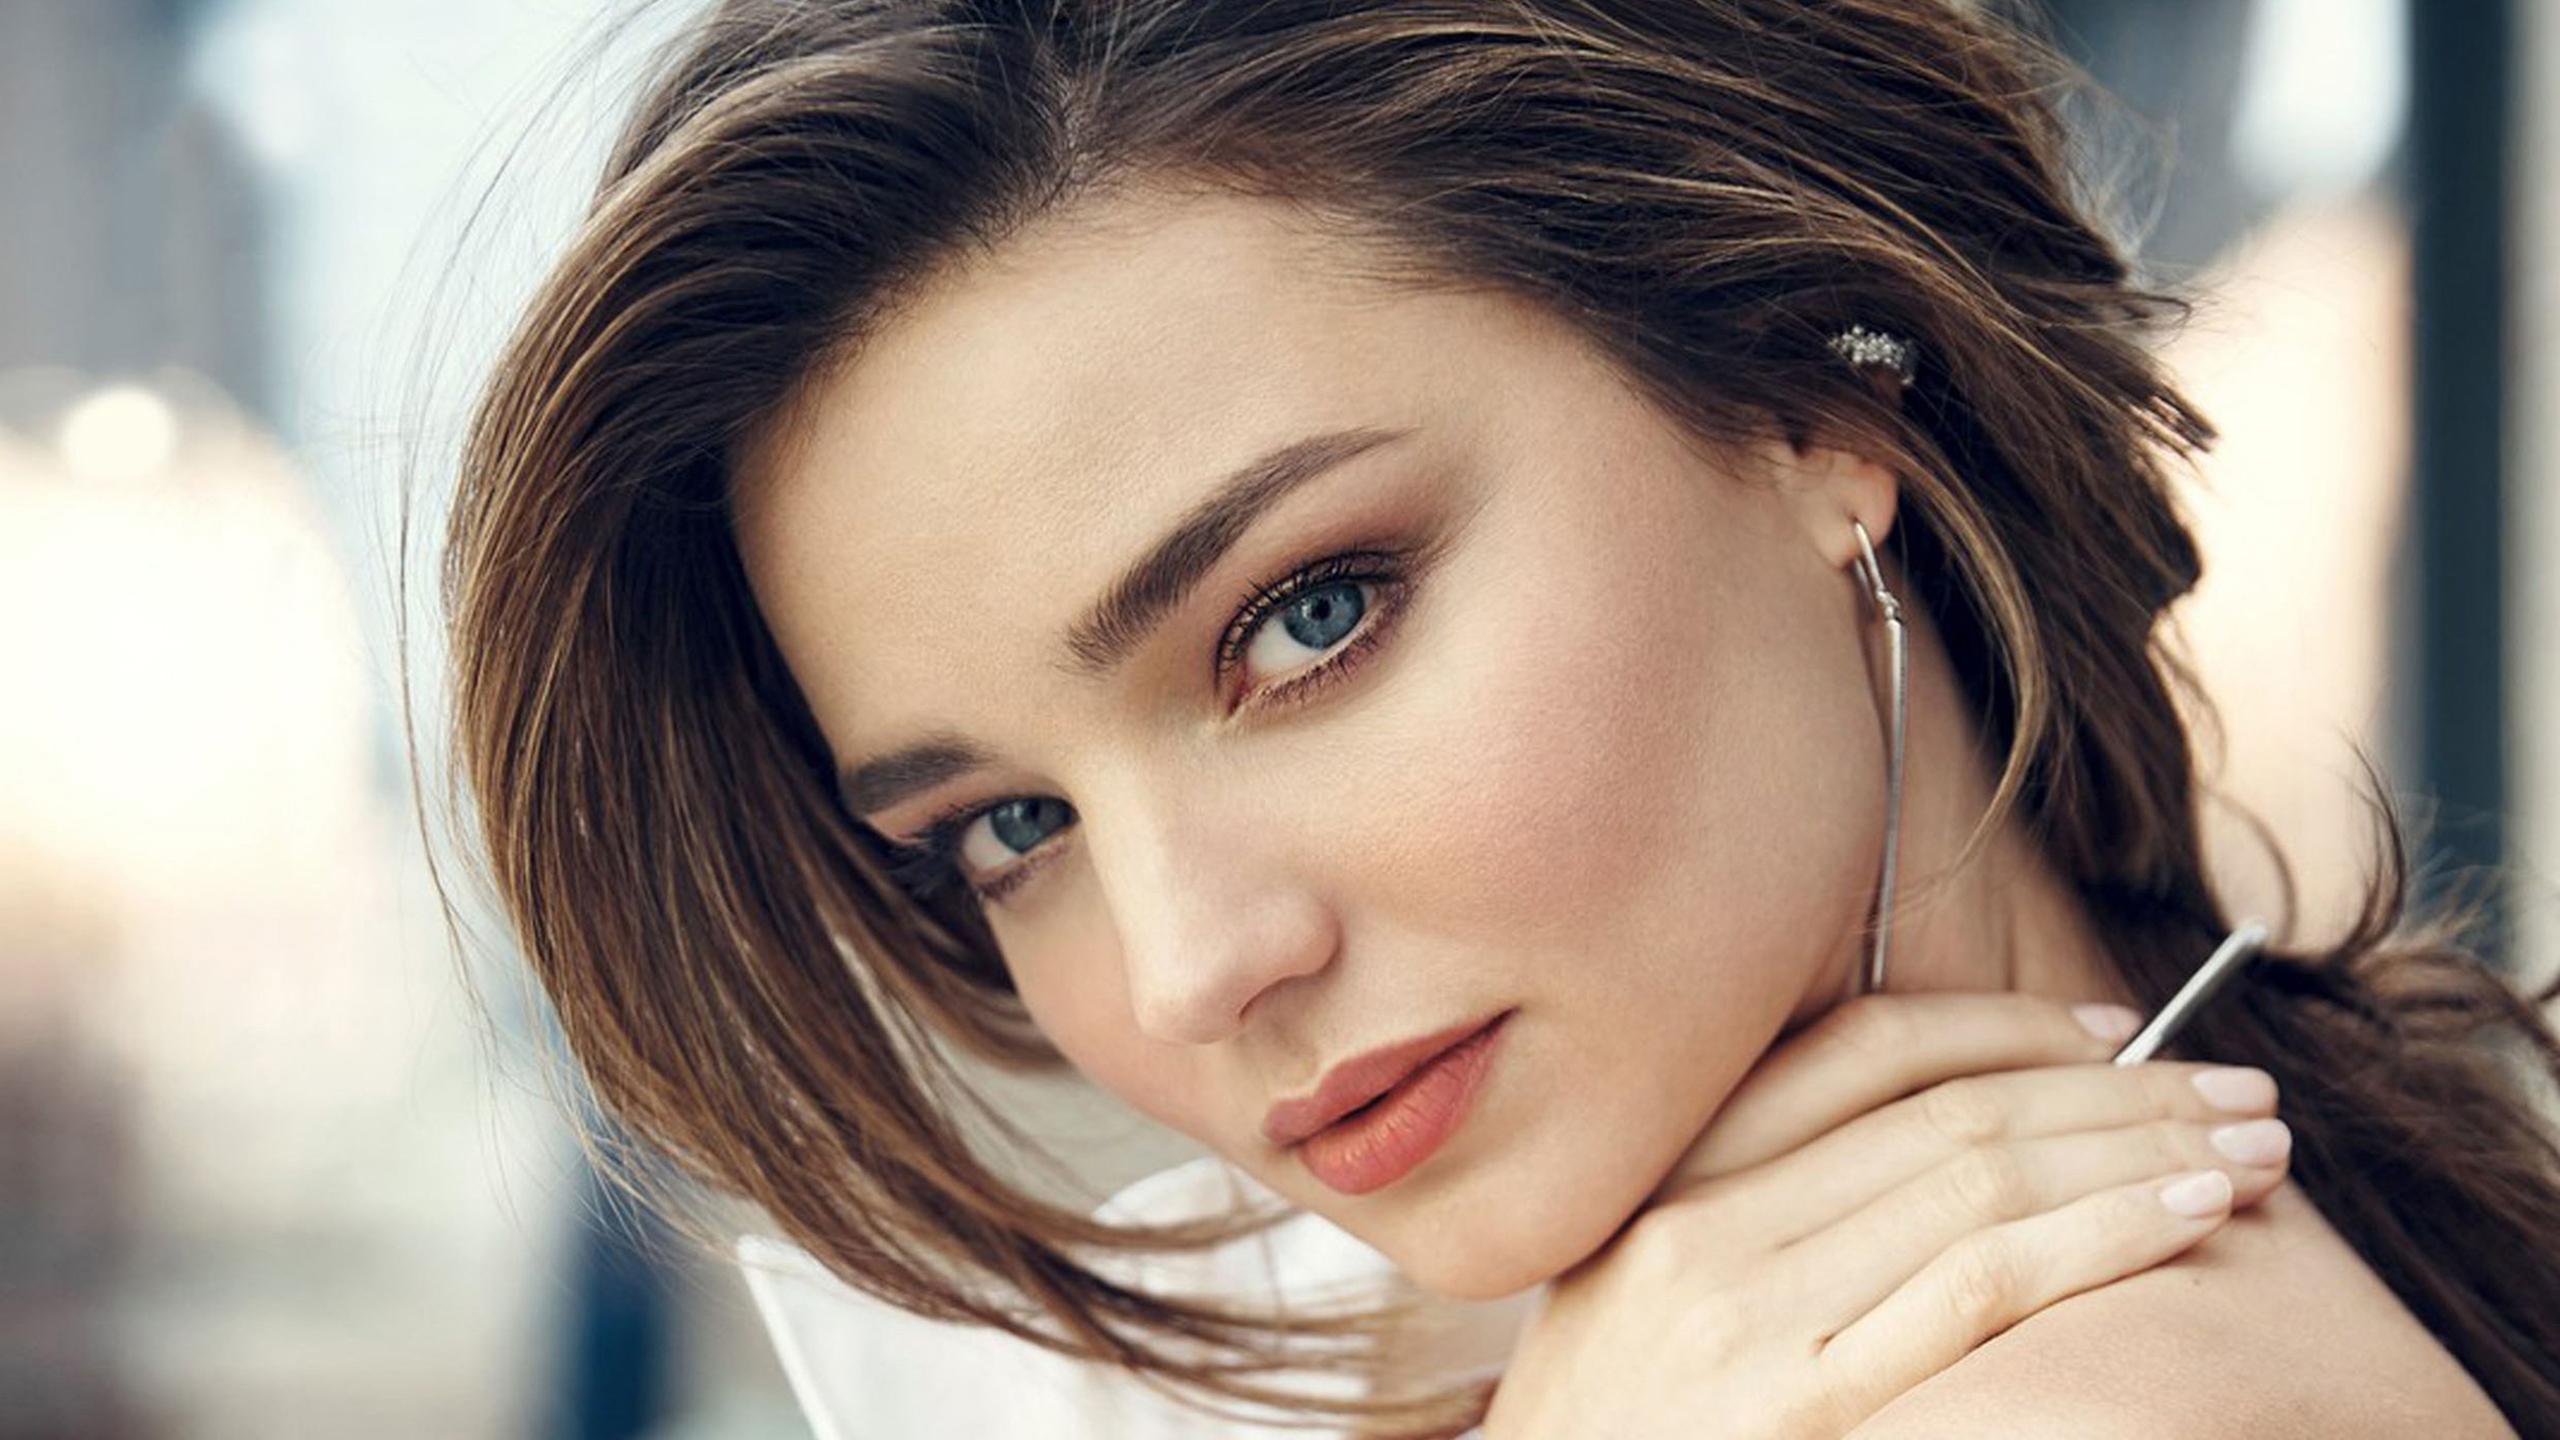 Miranda Kerr HD Wallpaper   Background Image   2560x1440